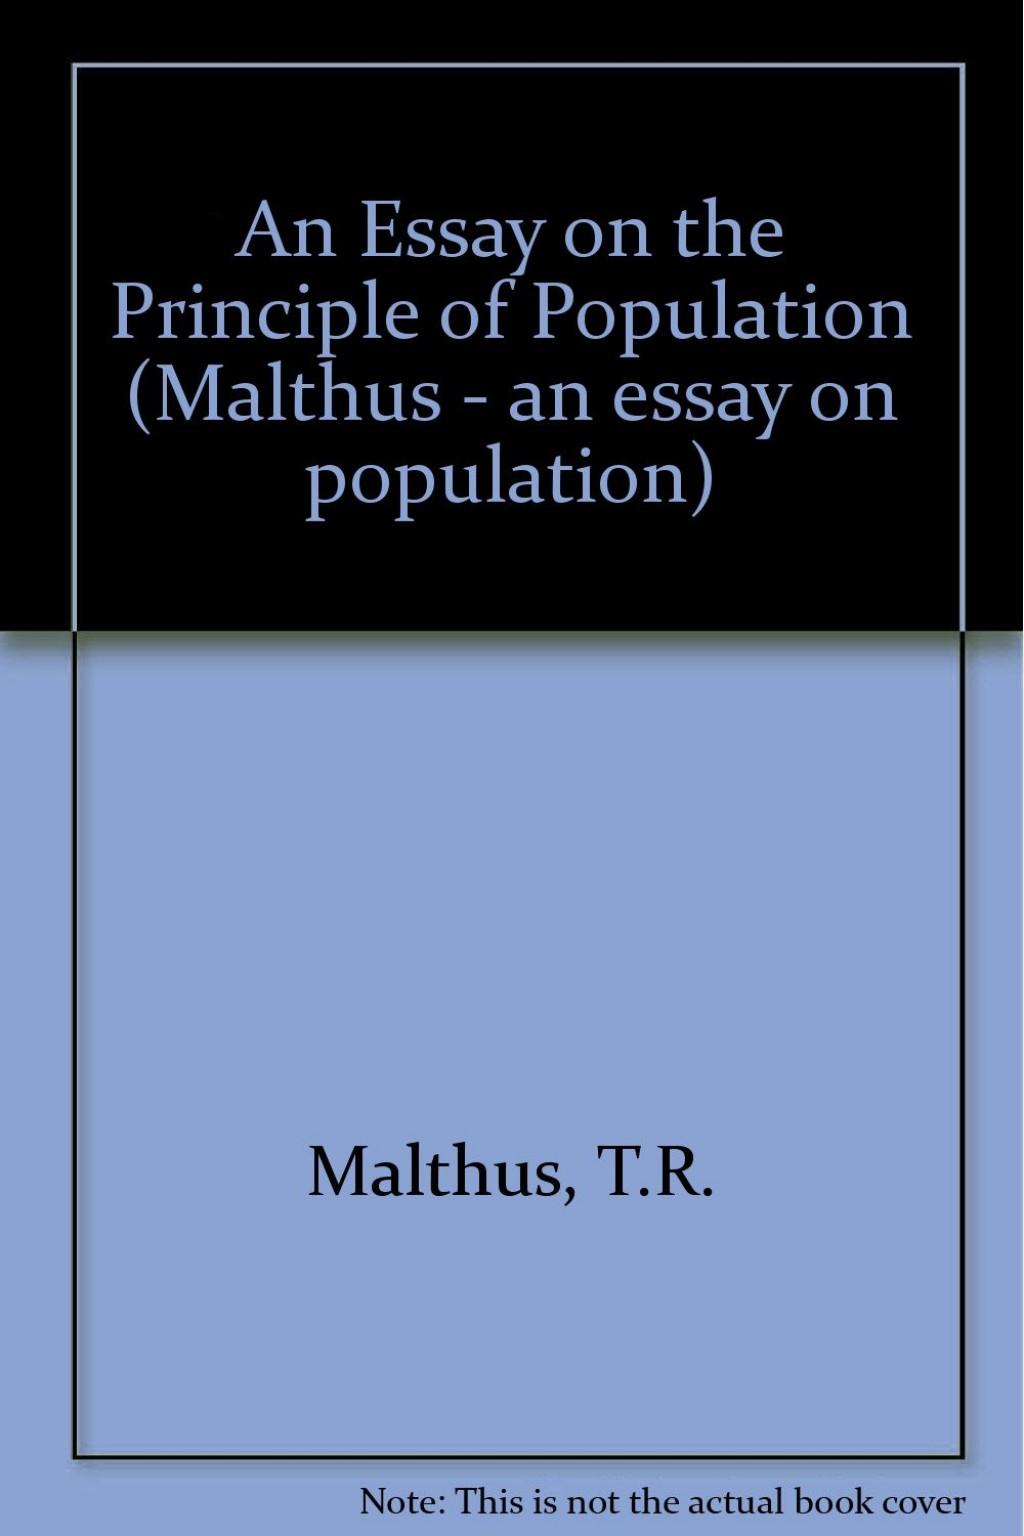 011 Thomas Malthus Essay On The Principle Of Population 61cetxxixjl Stupendous After Reading Malthus's Principles Darwin Got Idea That Ap Euro Large